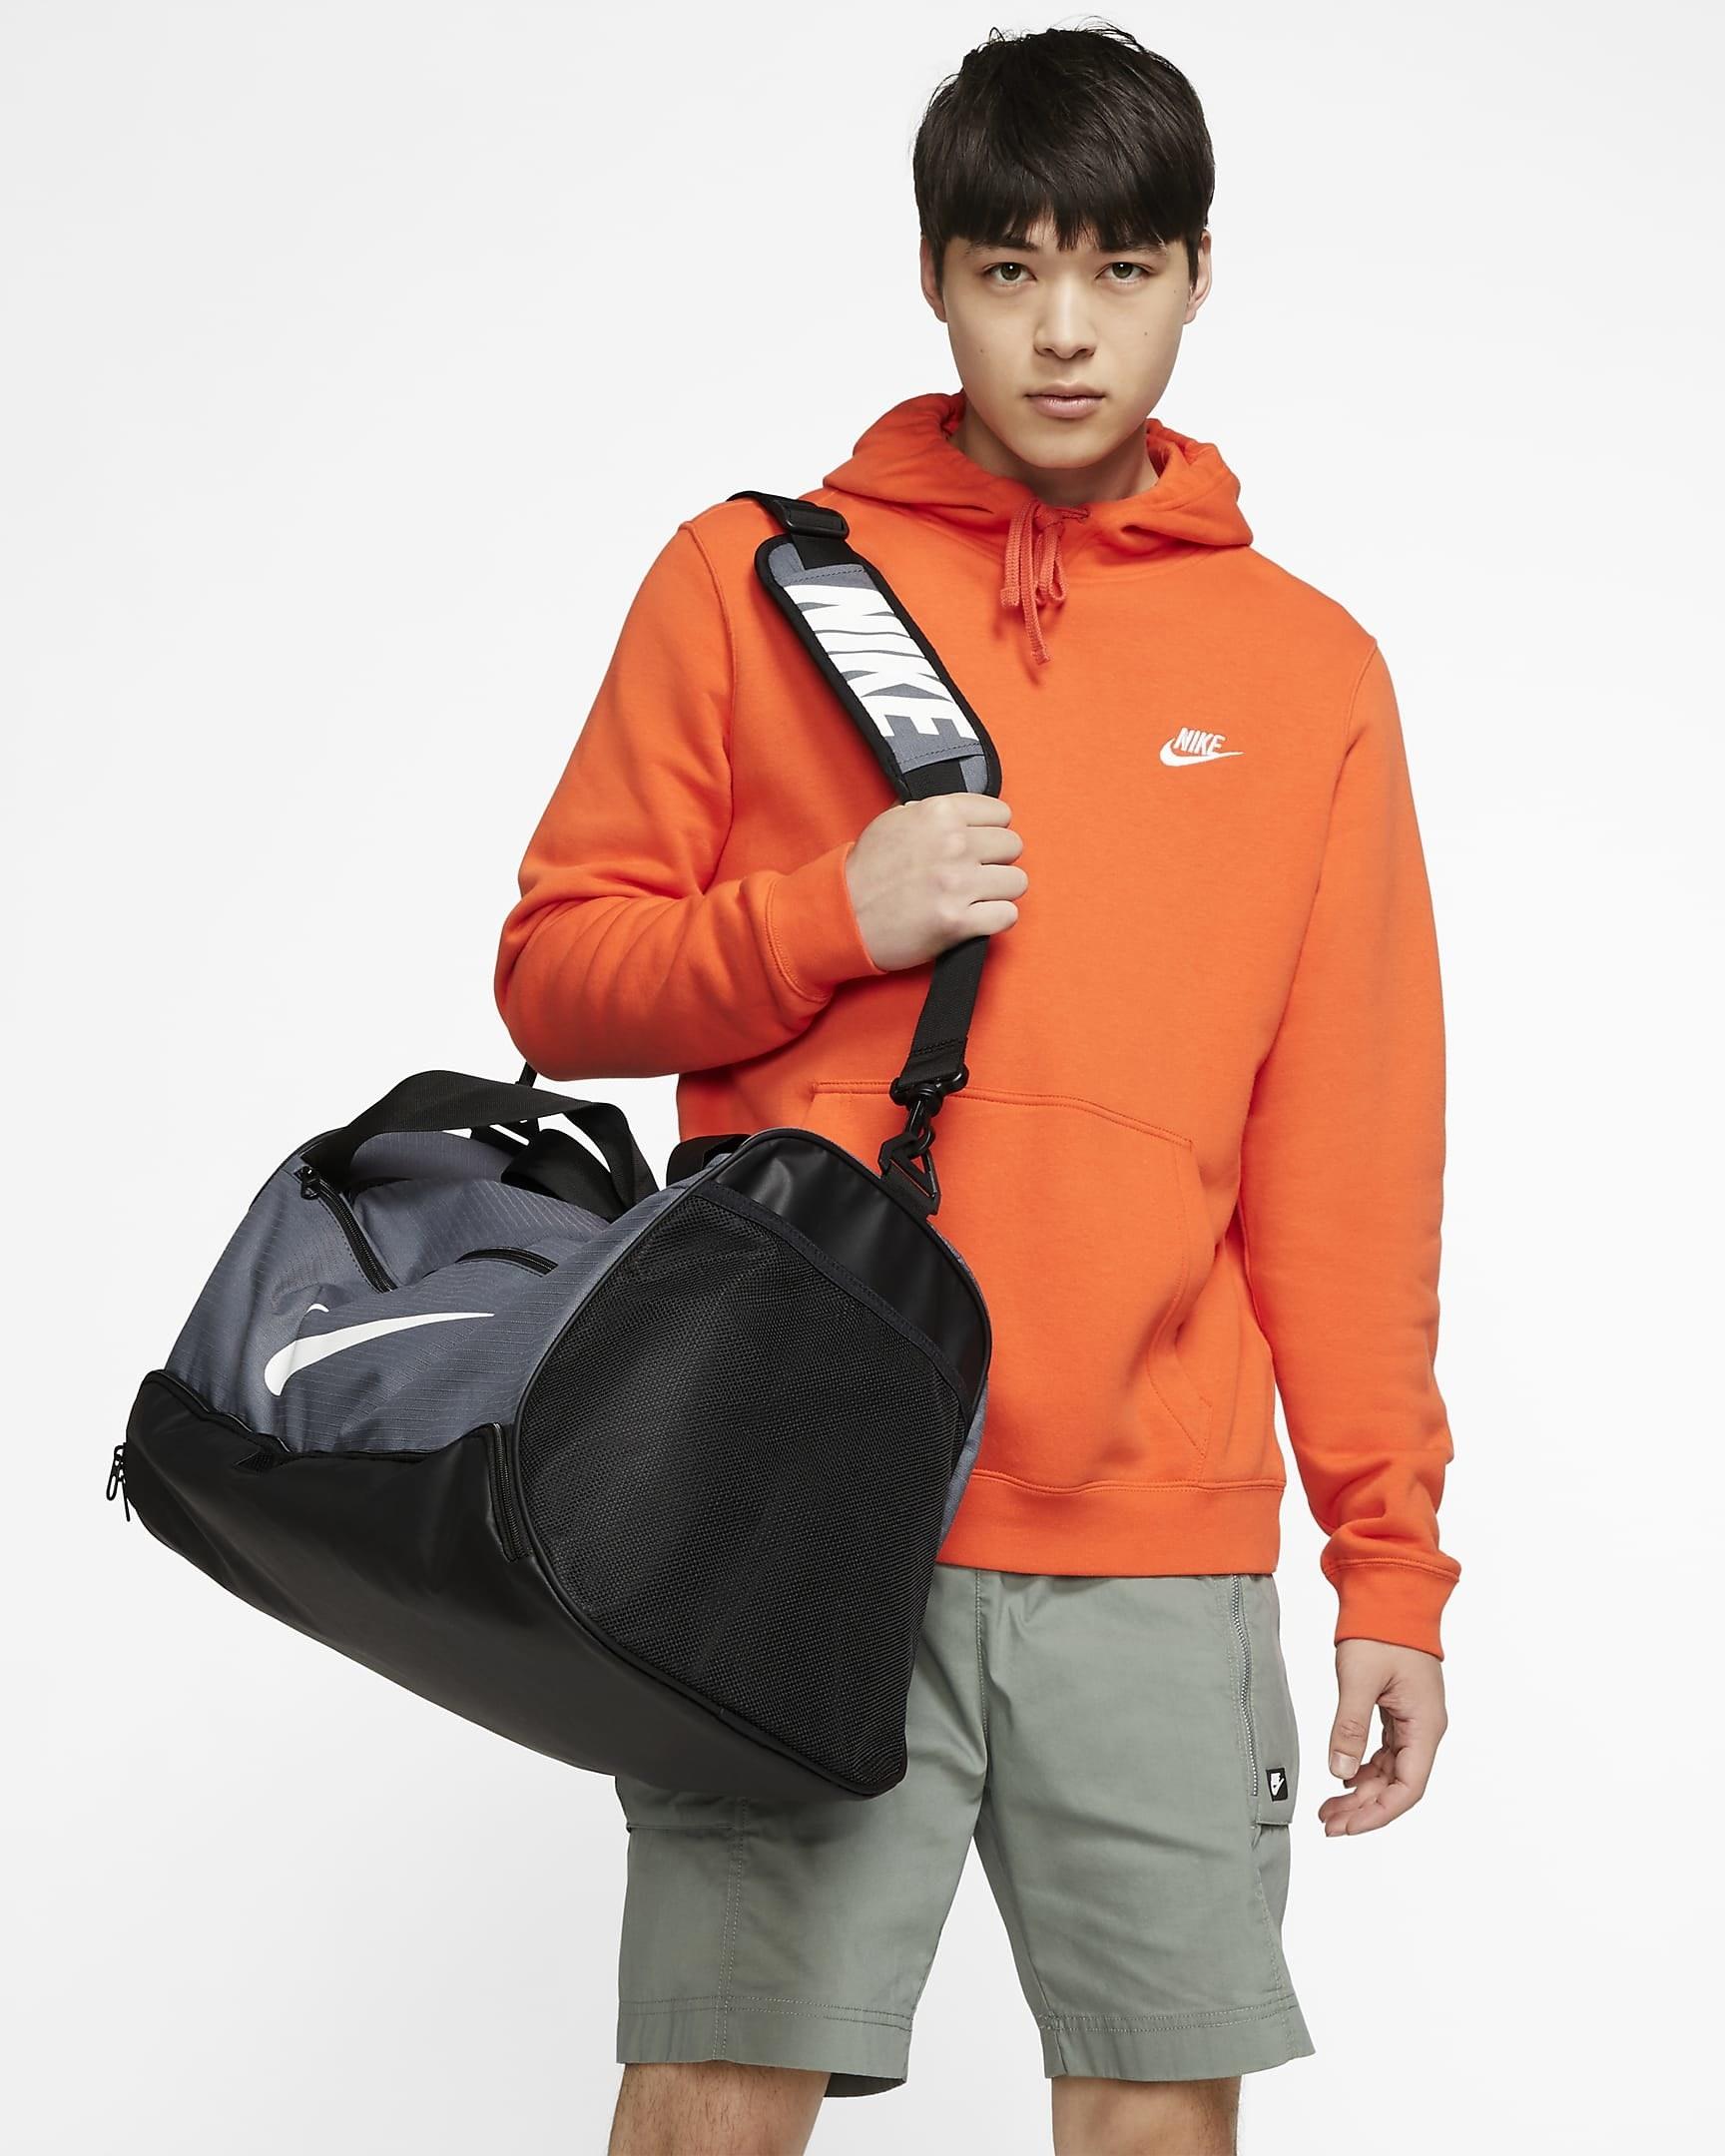 Model carrying black and grey duffle bag